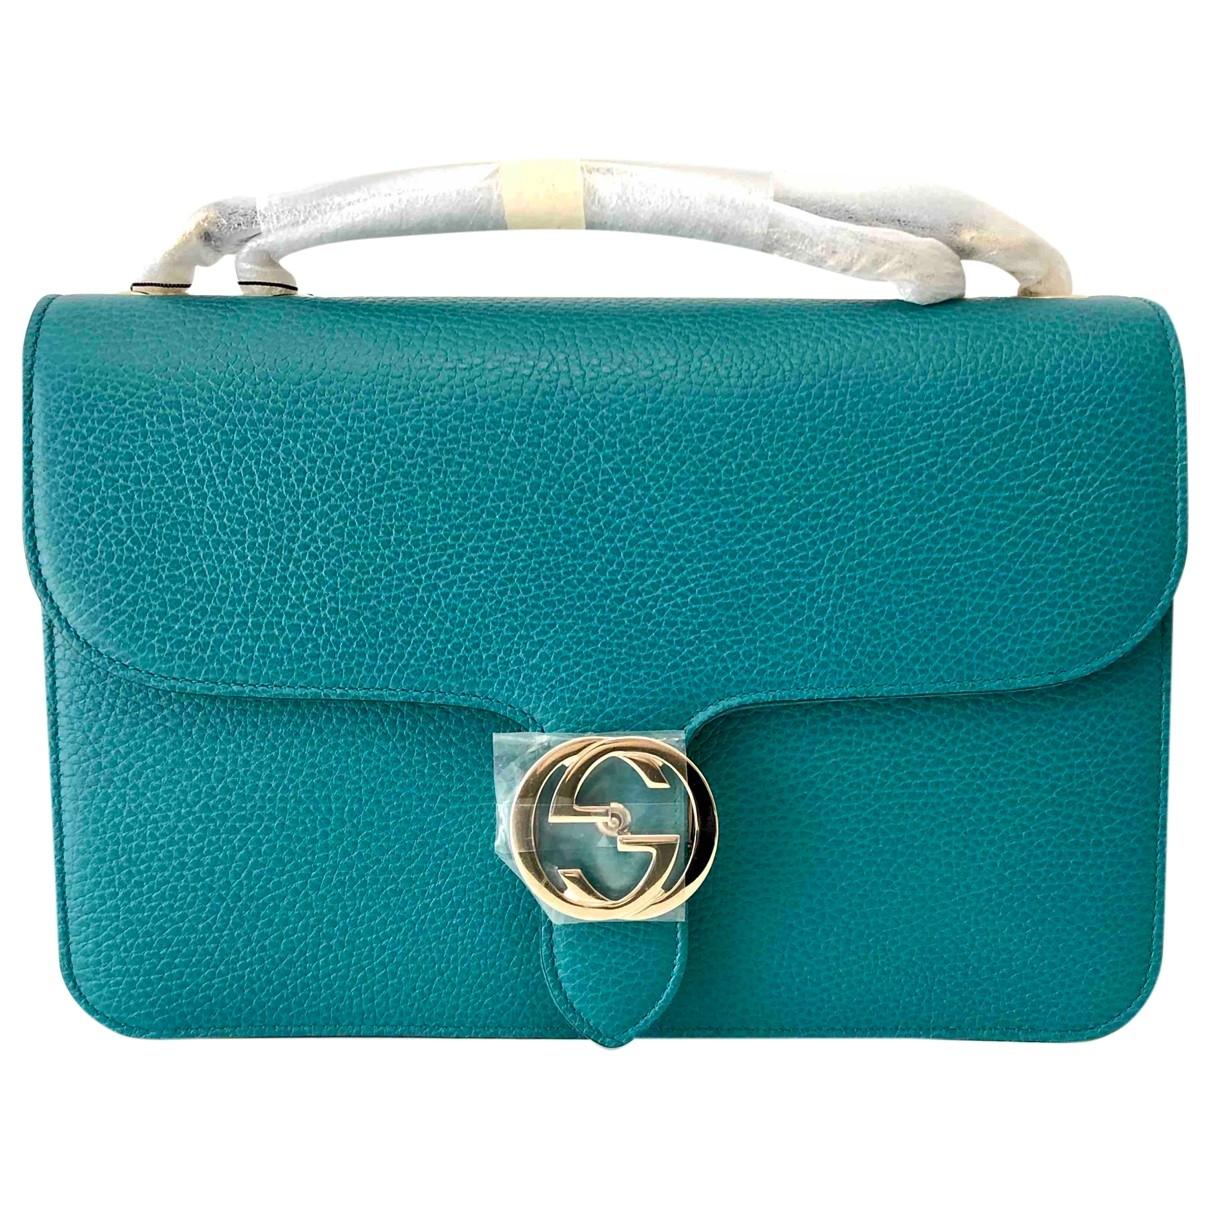 Gucci Interlocking Turquoise Leather handbag for Women \N